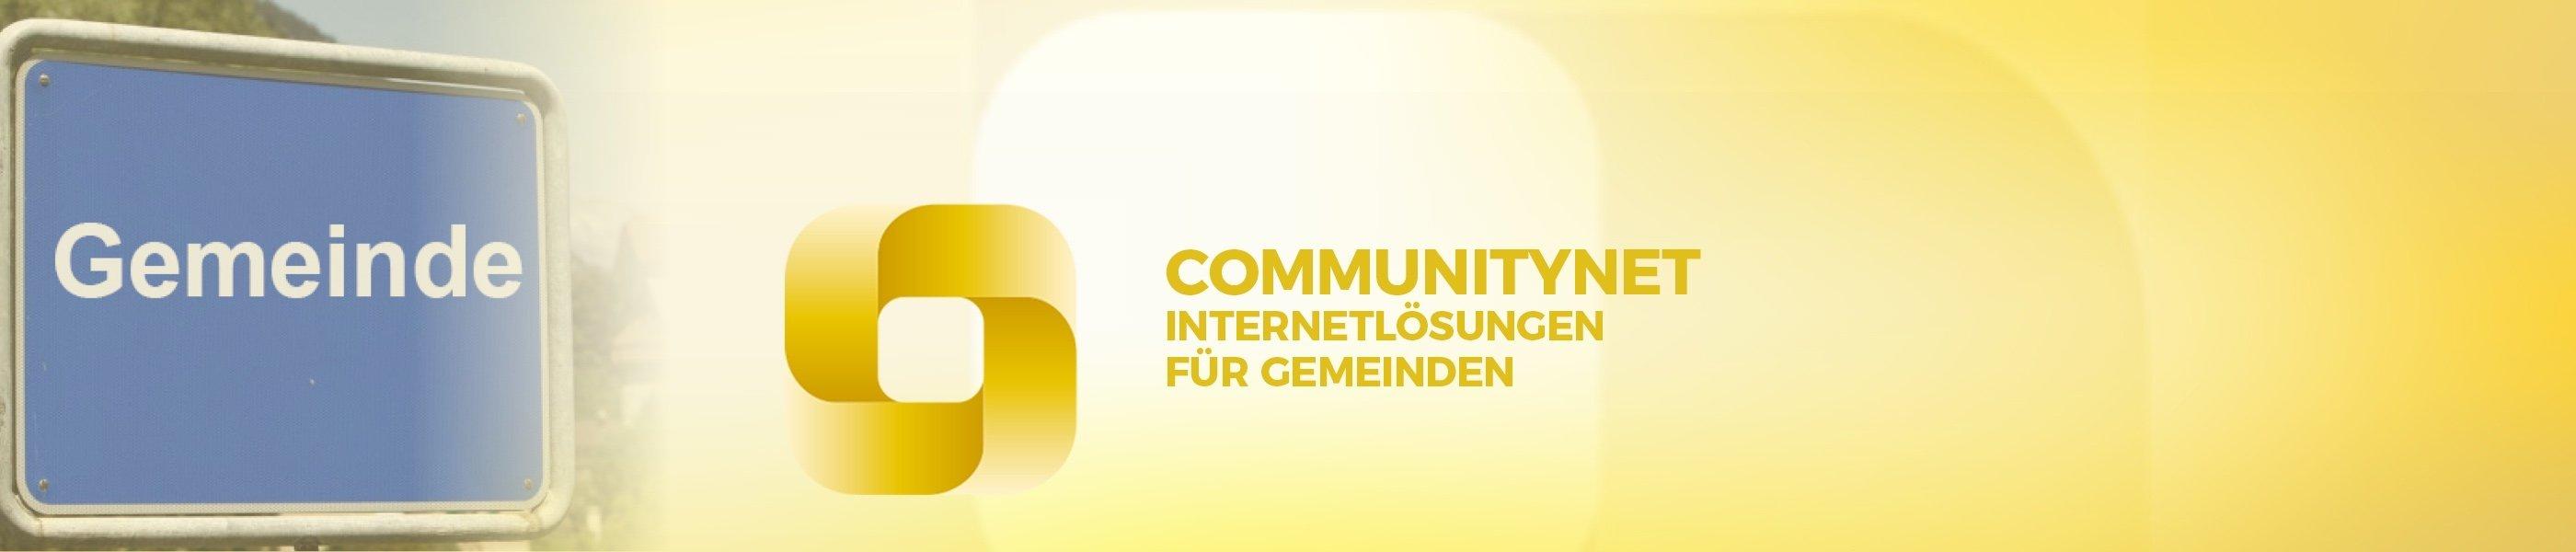 CommunityNet-header-lg